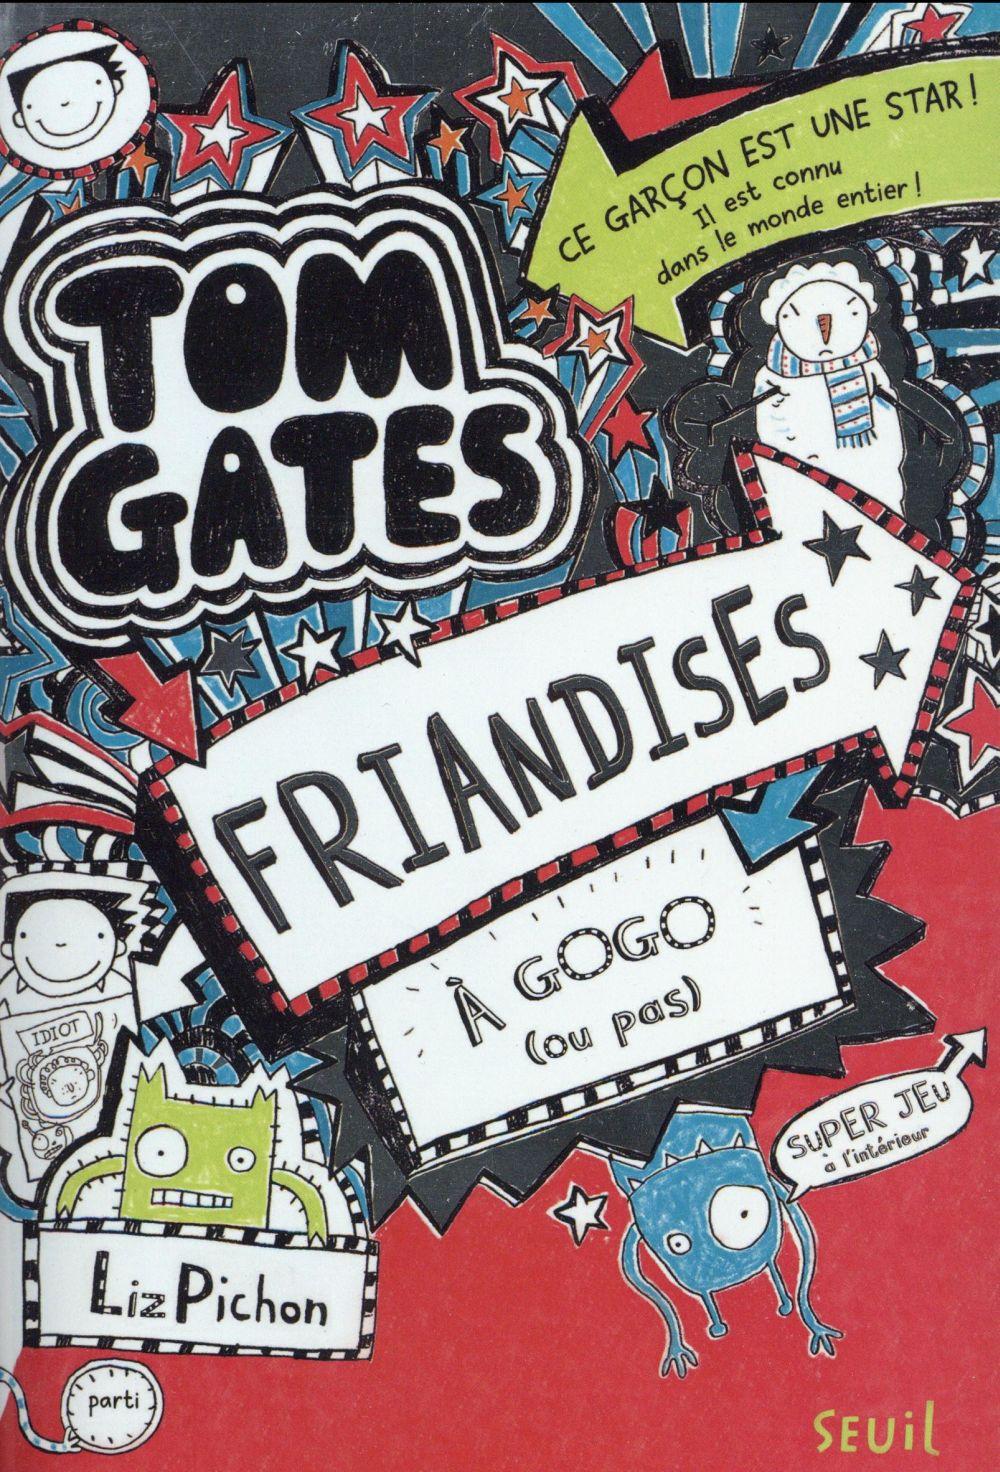 TOM GATES - TOME 6 FRIANDISES A GOGO (OU PAS) - VOLUME 06